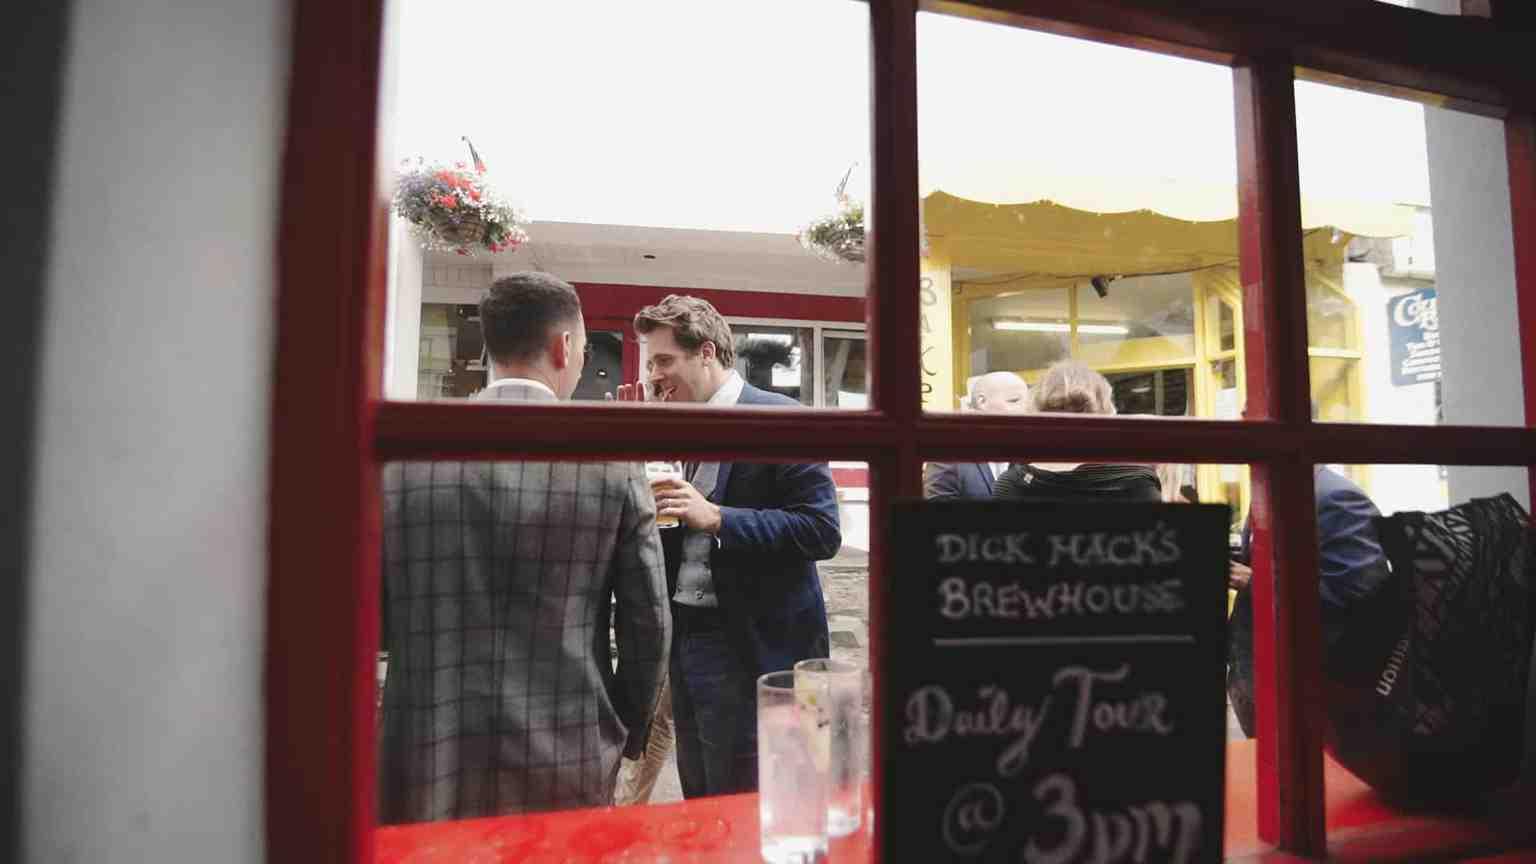 Look by window from inside of bar